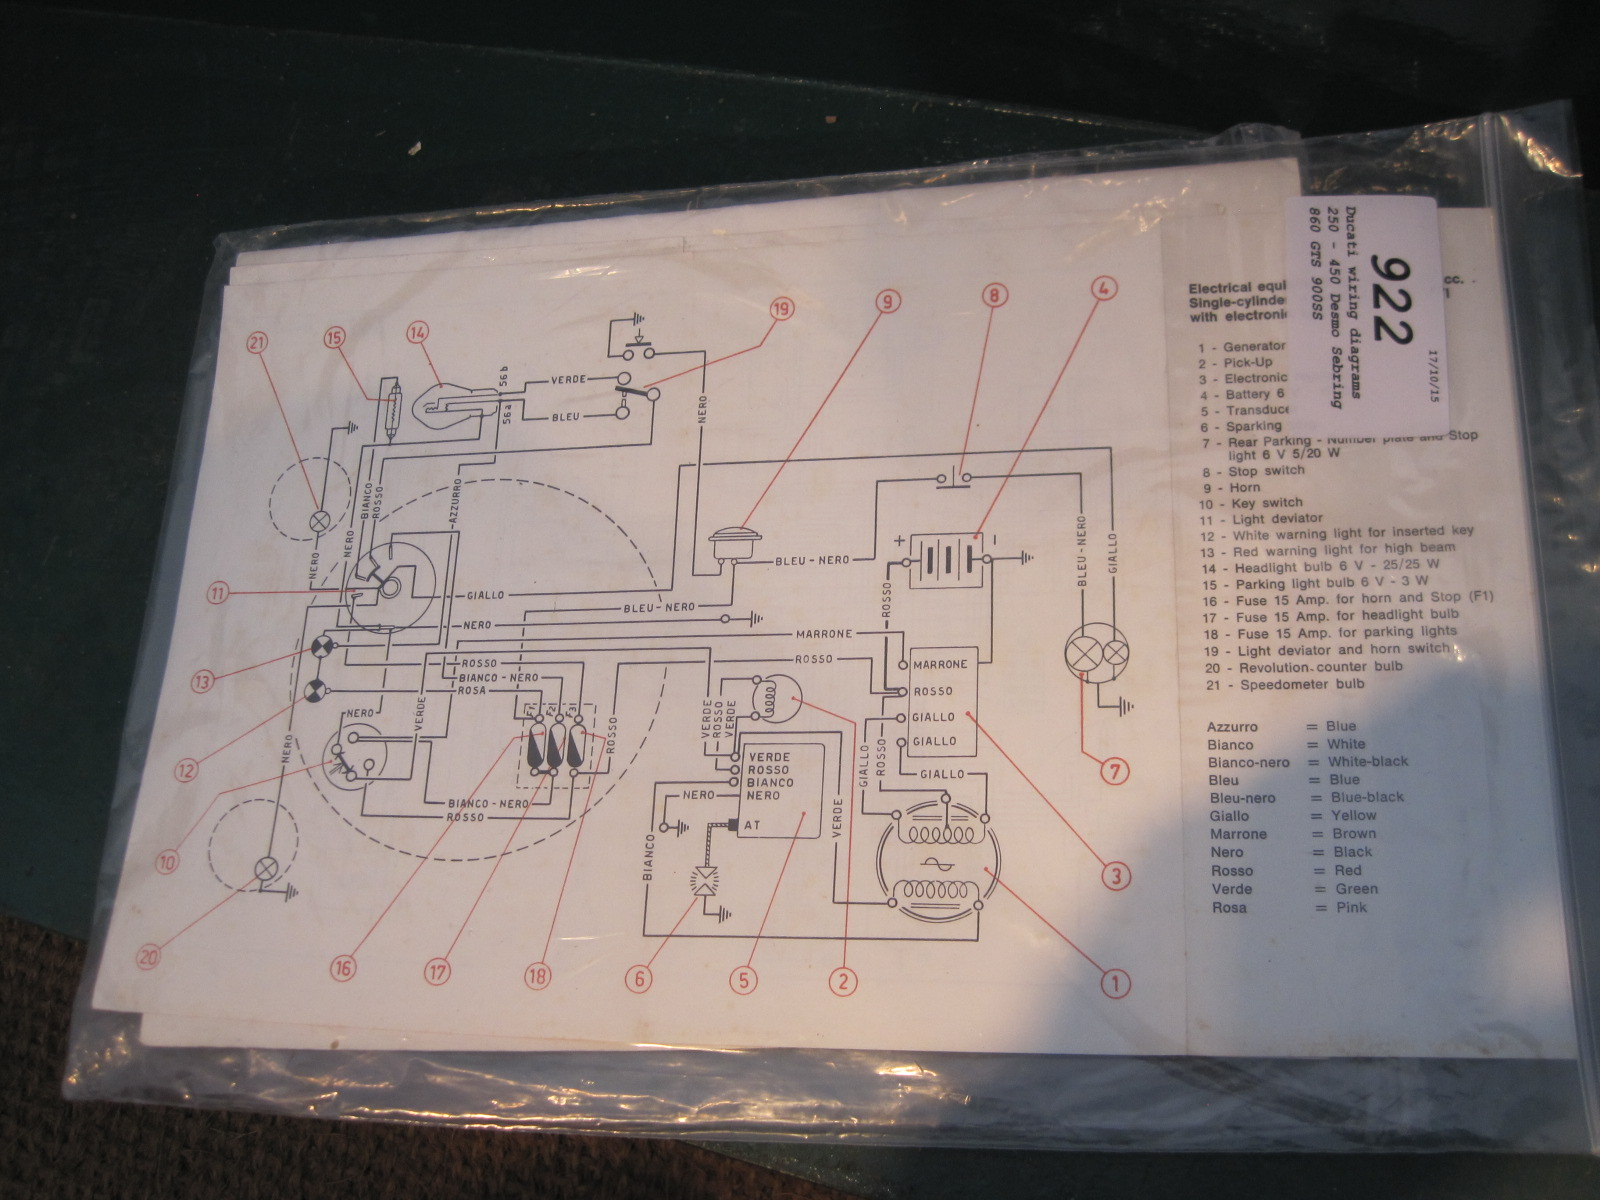 ducati single wiring wiring diagram ebookducati 450 wiring diagram wiring diagram 2019ducati 900ss wiring diagram wiring librarylot 922 ducati wiring diagrams